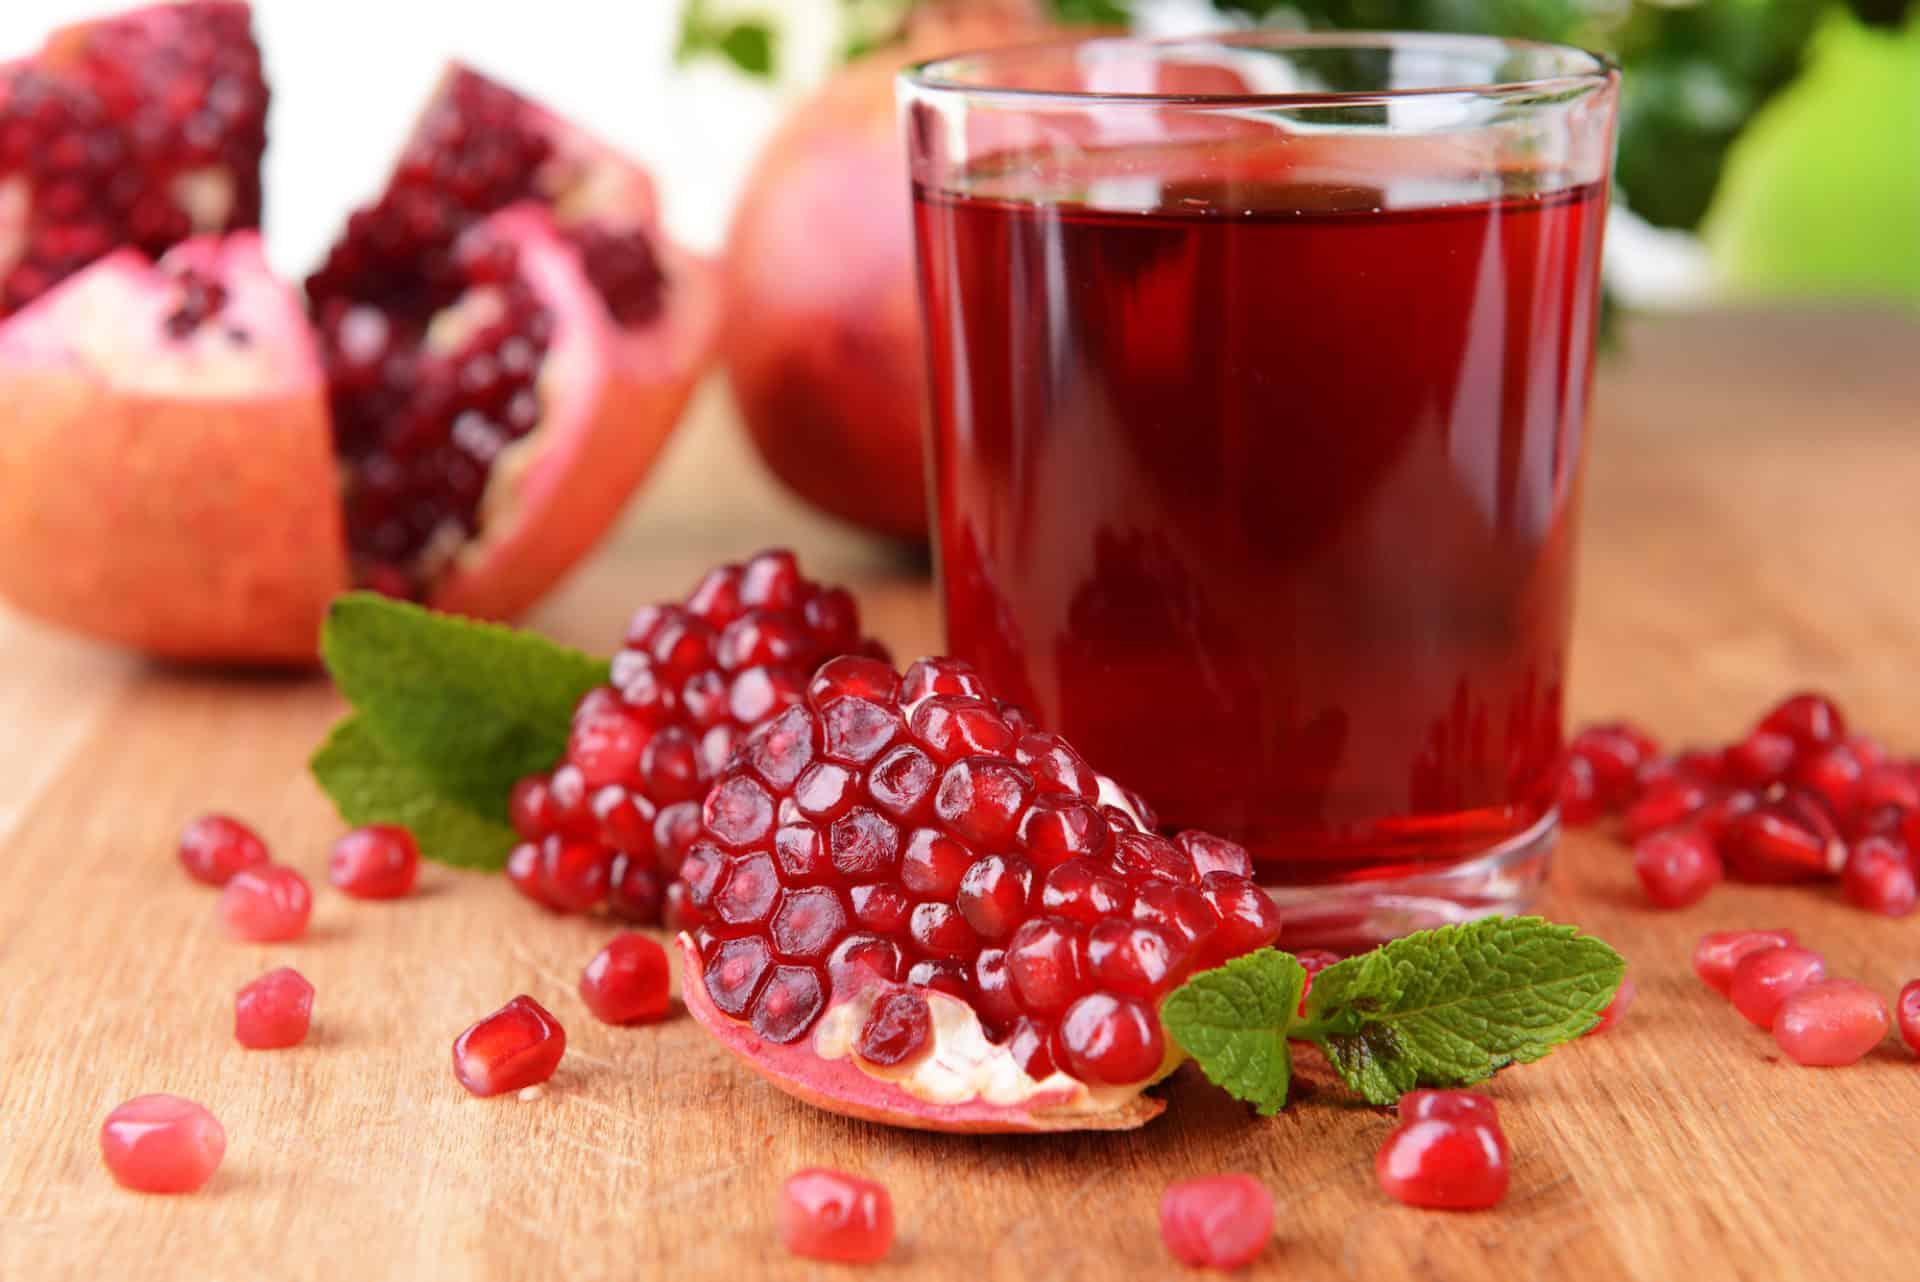 Best Pomegranate Juice Brands 2020